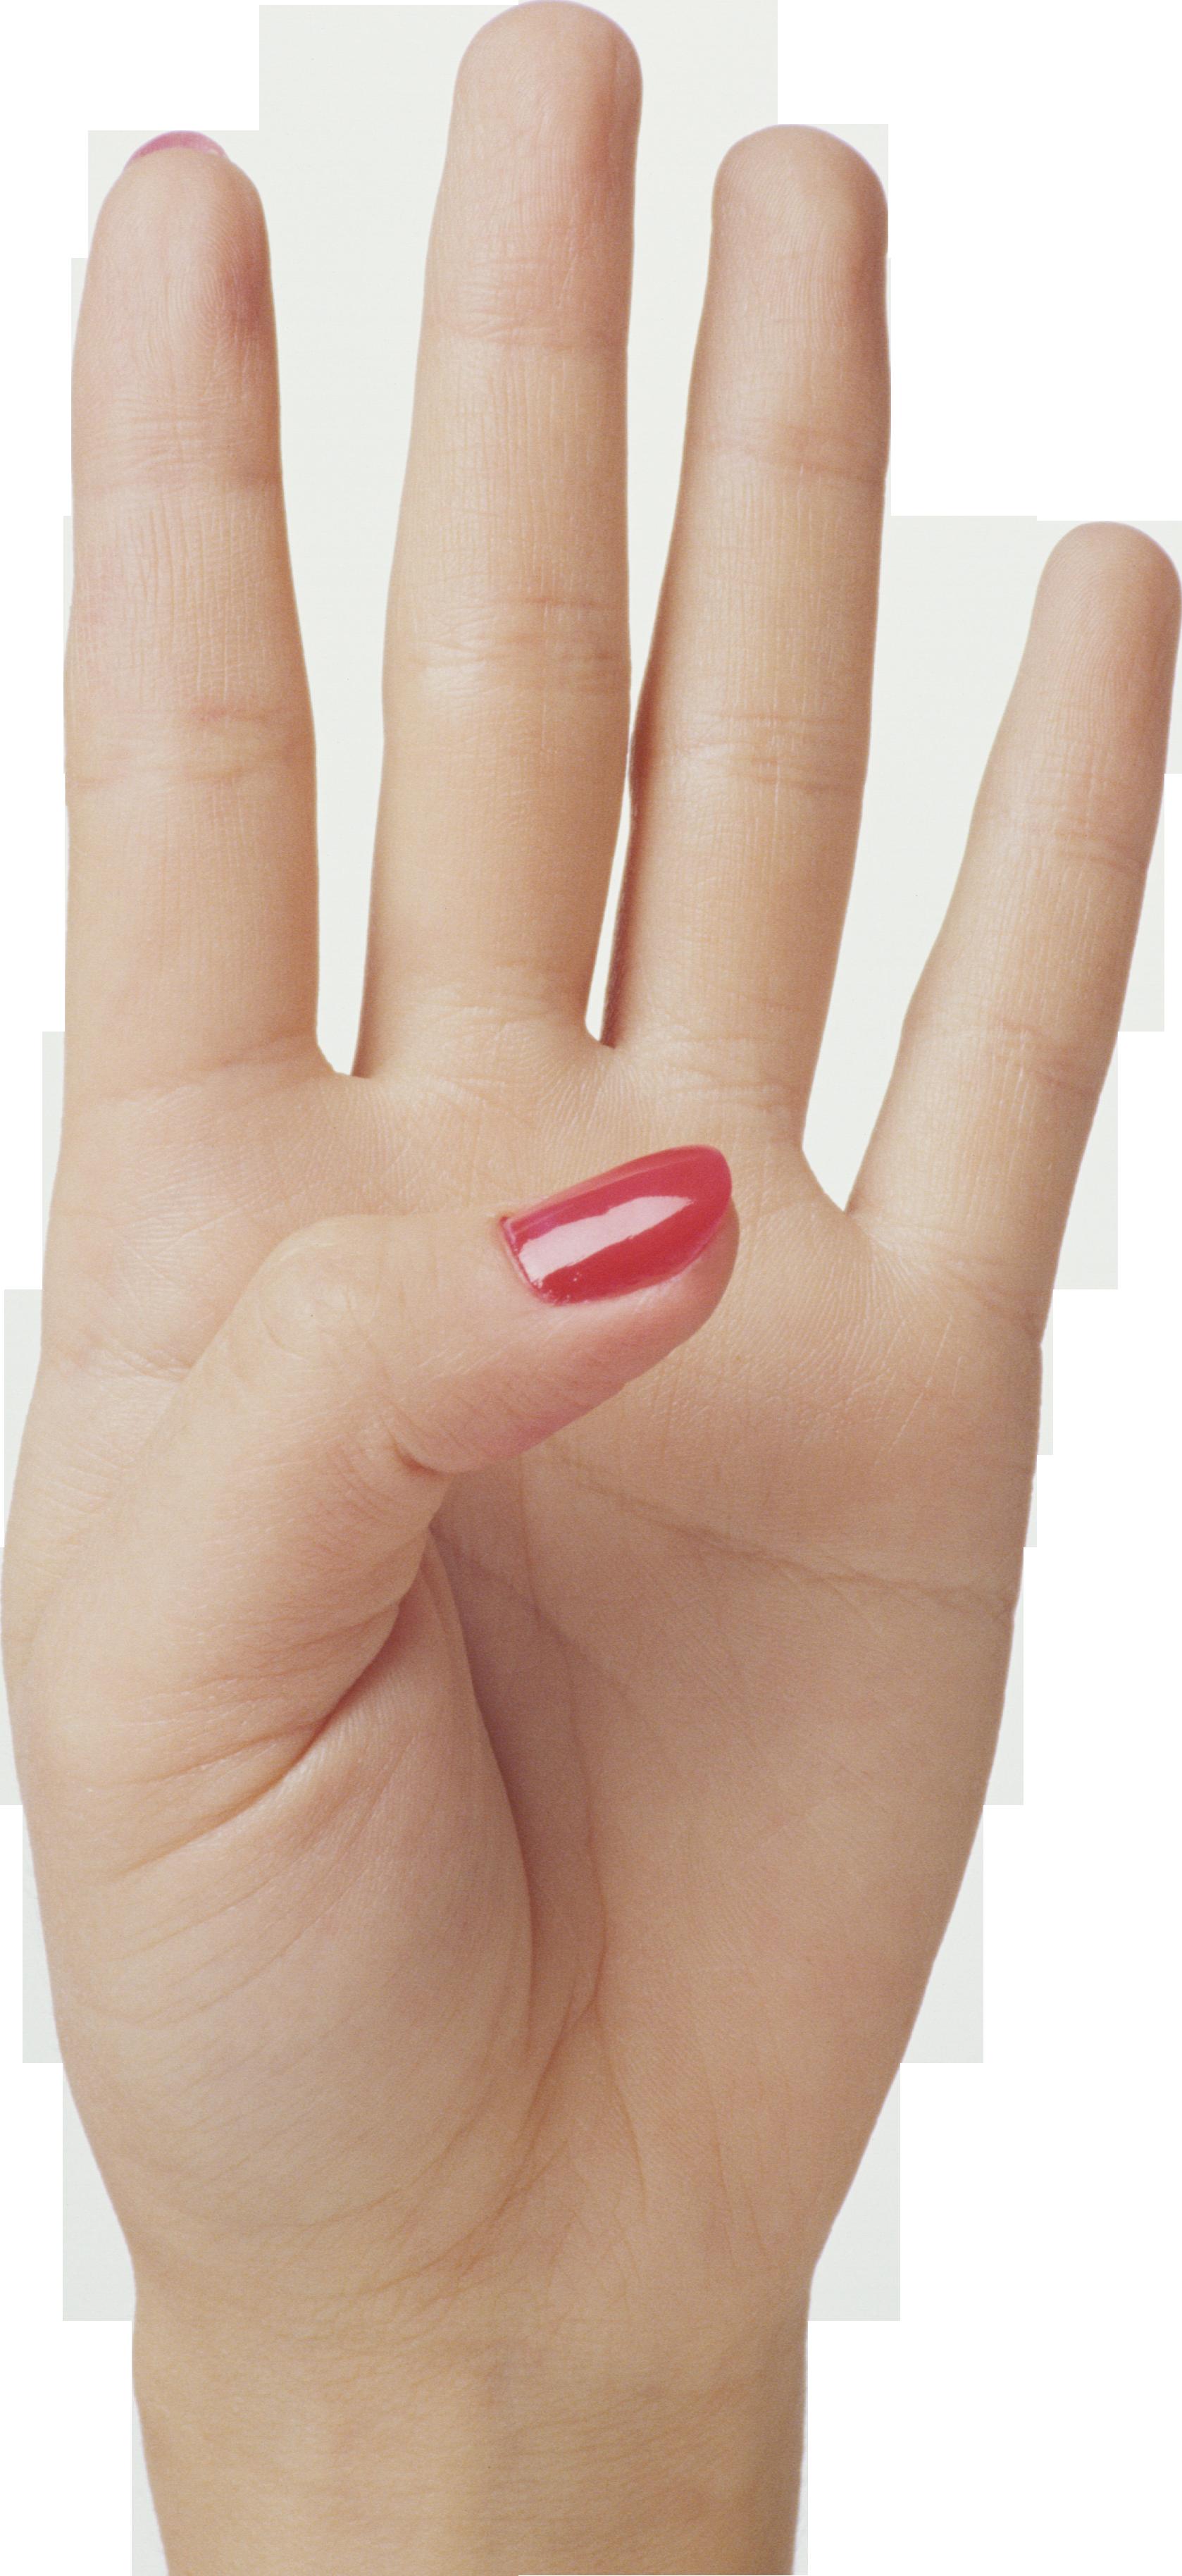 png free Finger transparent four. Hand png image purepng